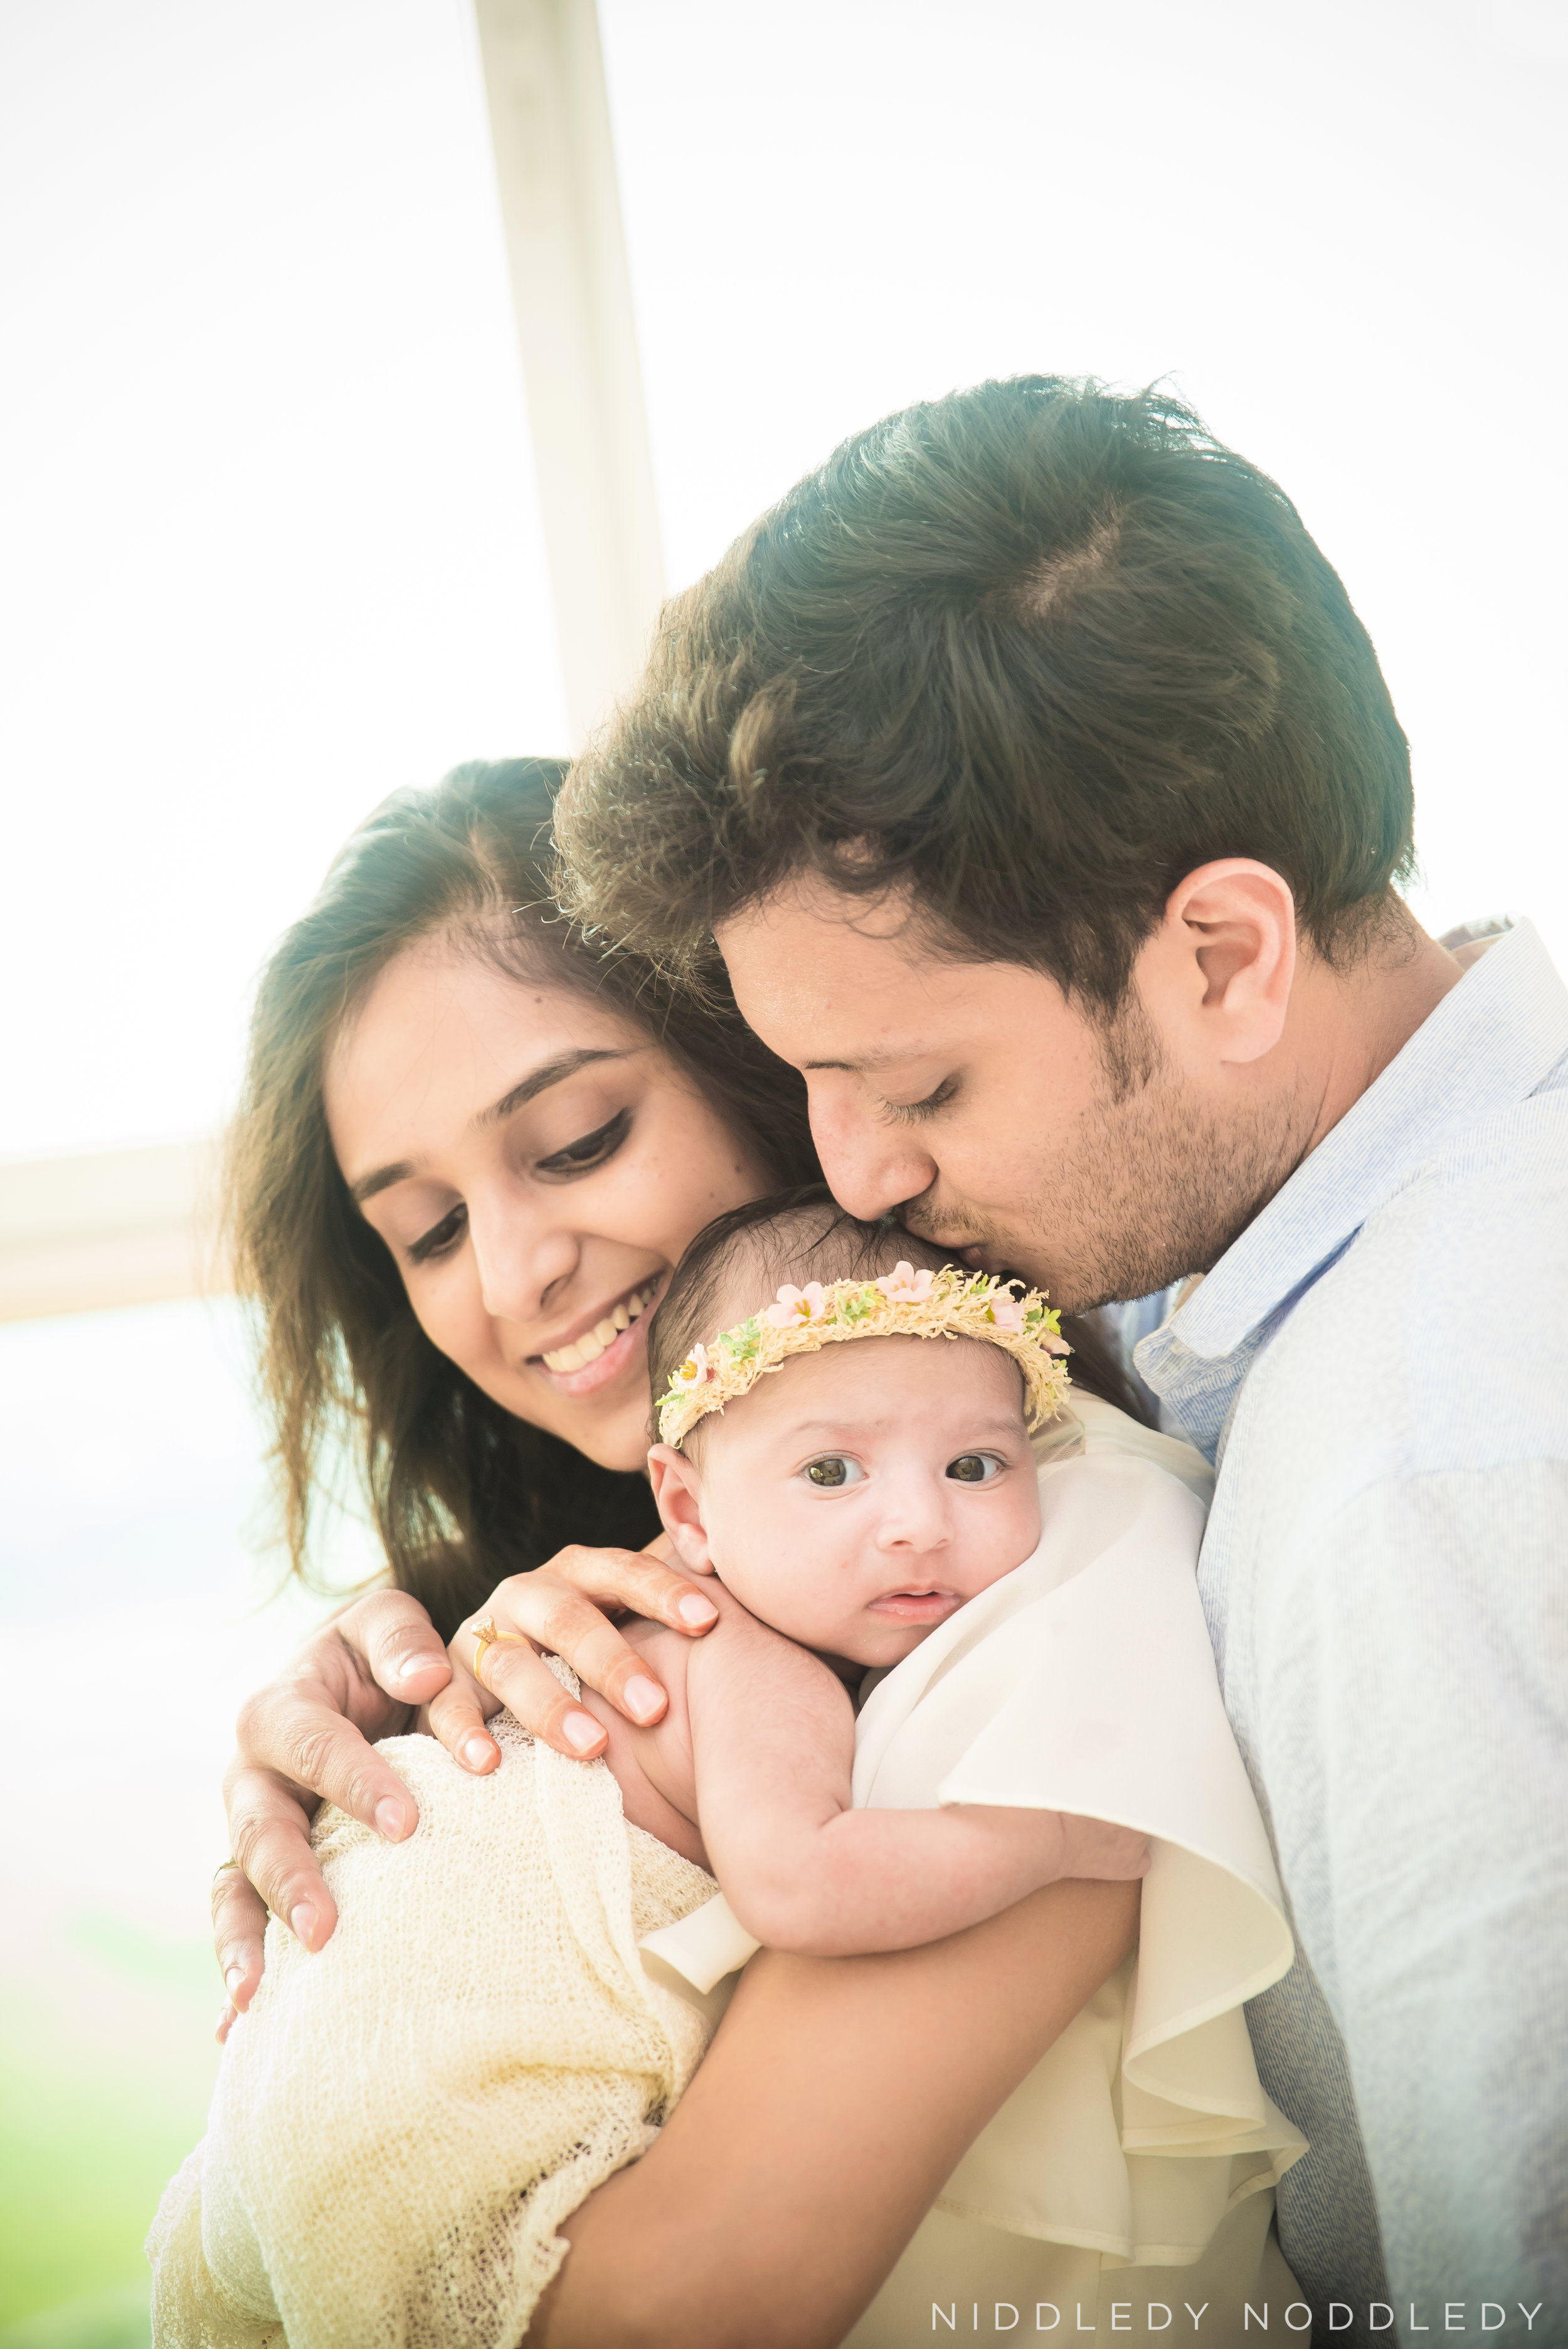 Saanvi Newborn Photoshoot ❤ NiddledyNoddledy.com ~ Bumps to Babies Photography, Kolkata - 10.jpg